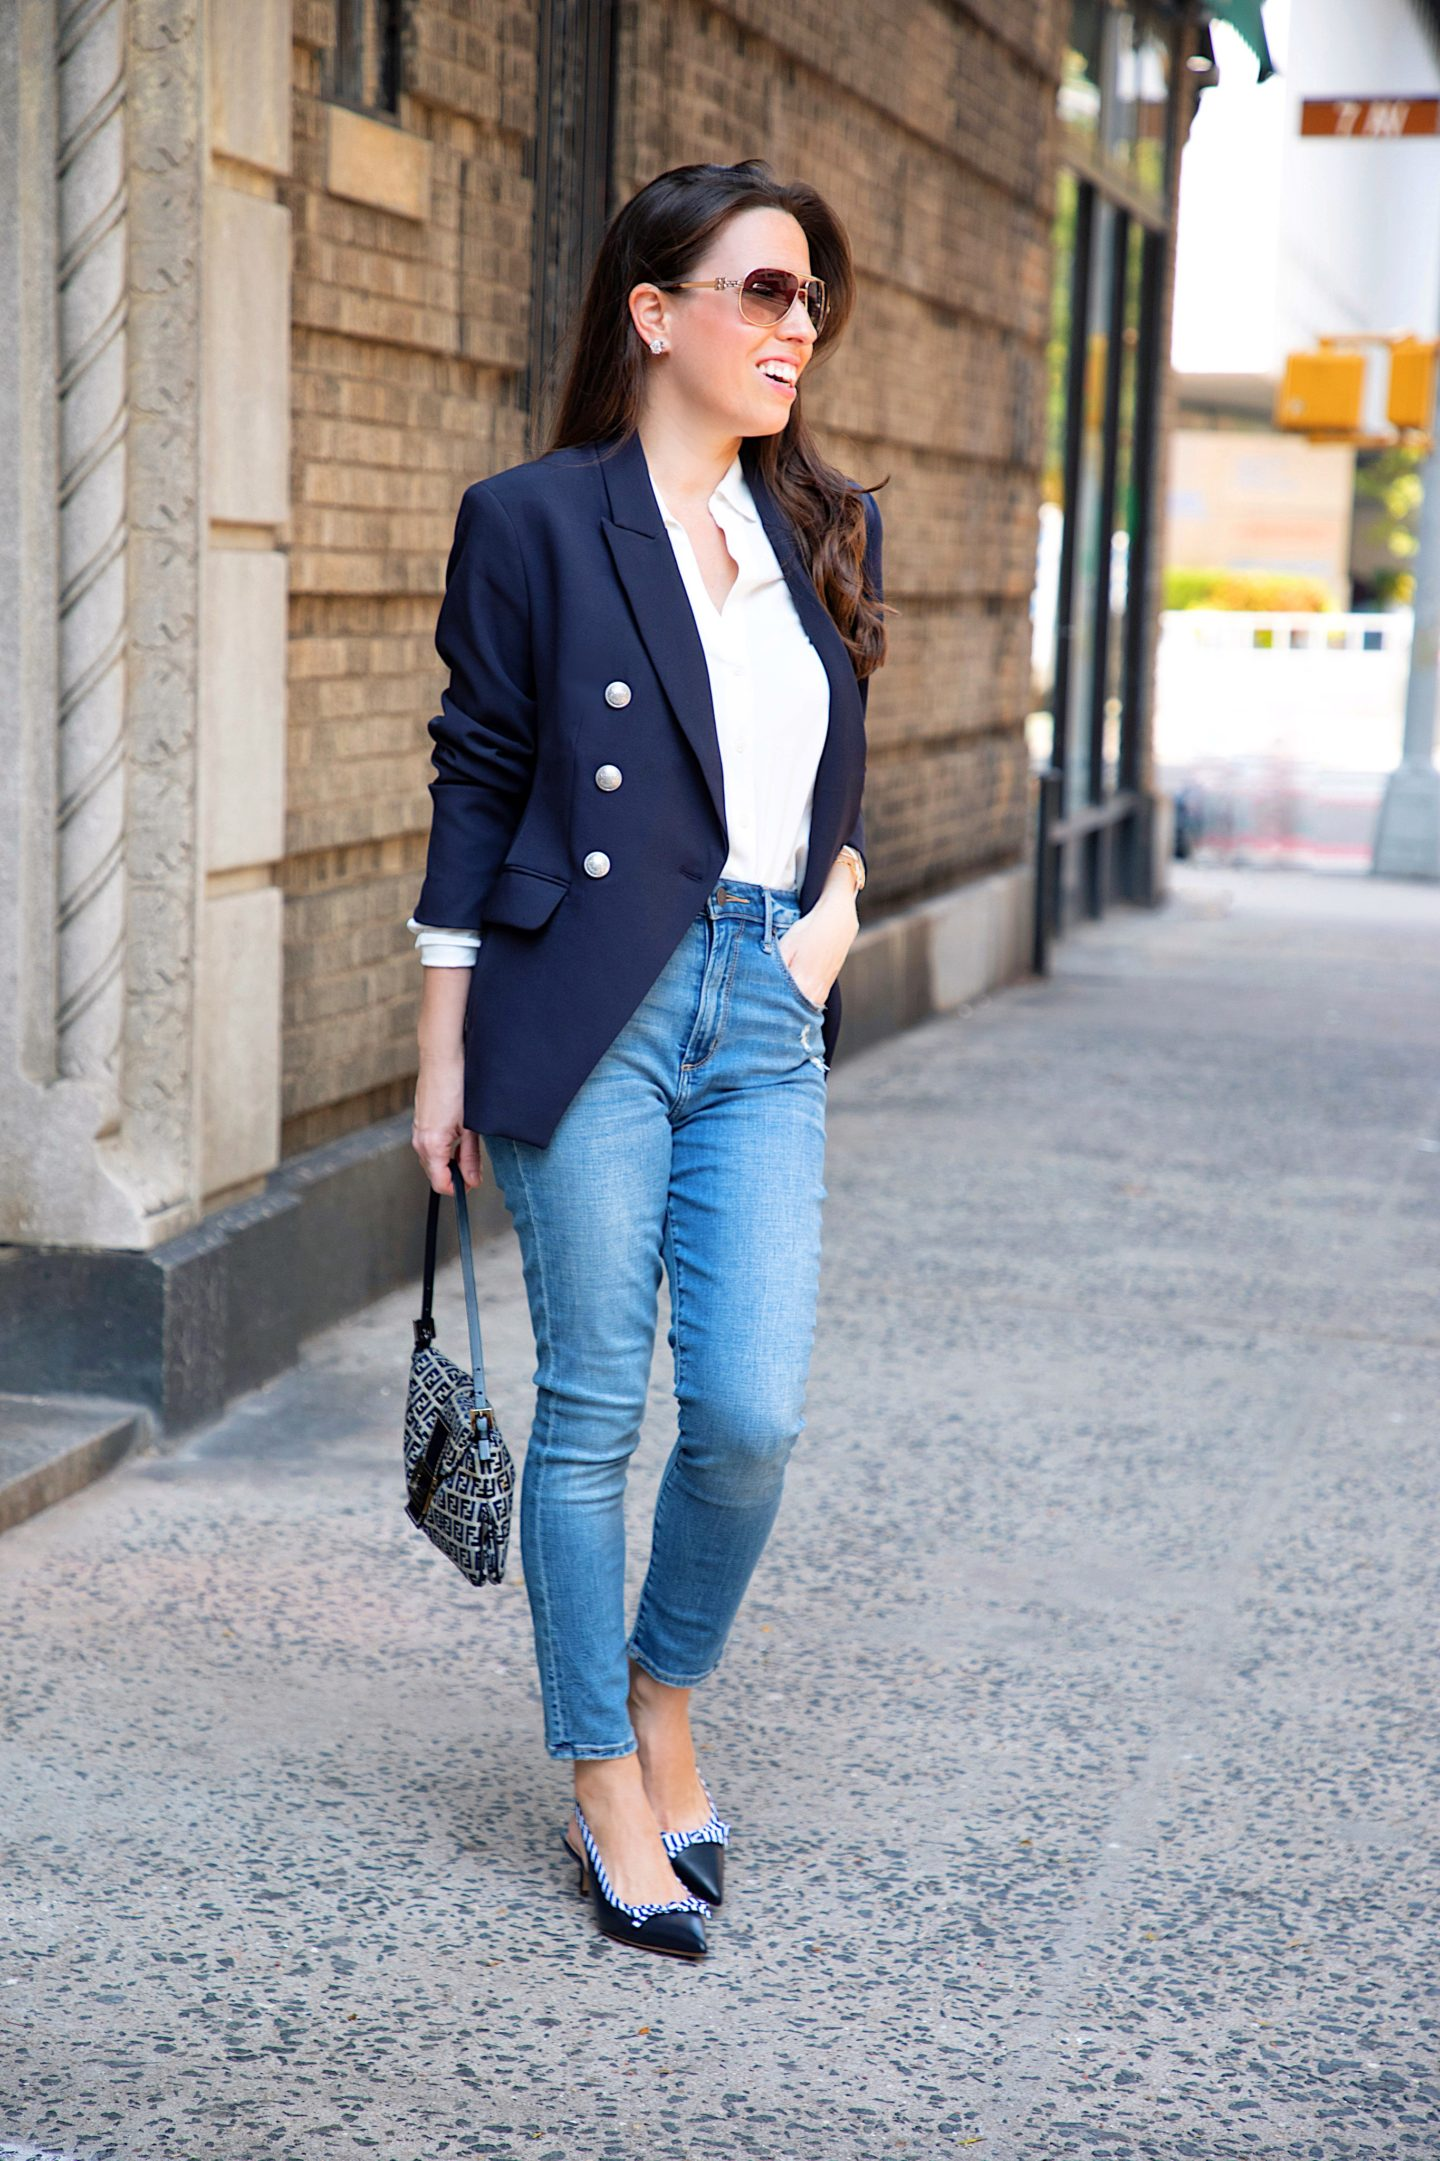 ana florentina wearing a navy blazer